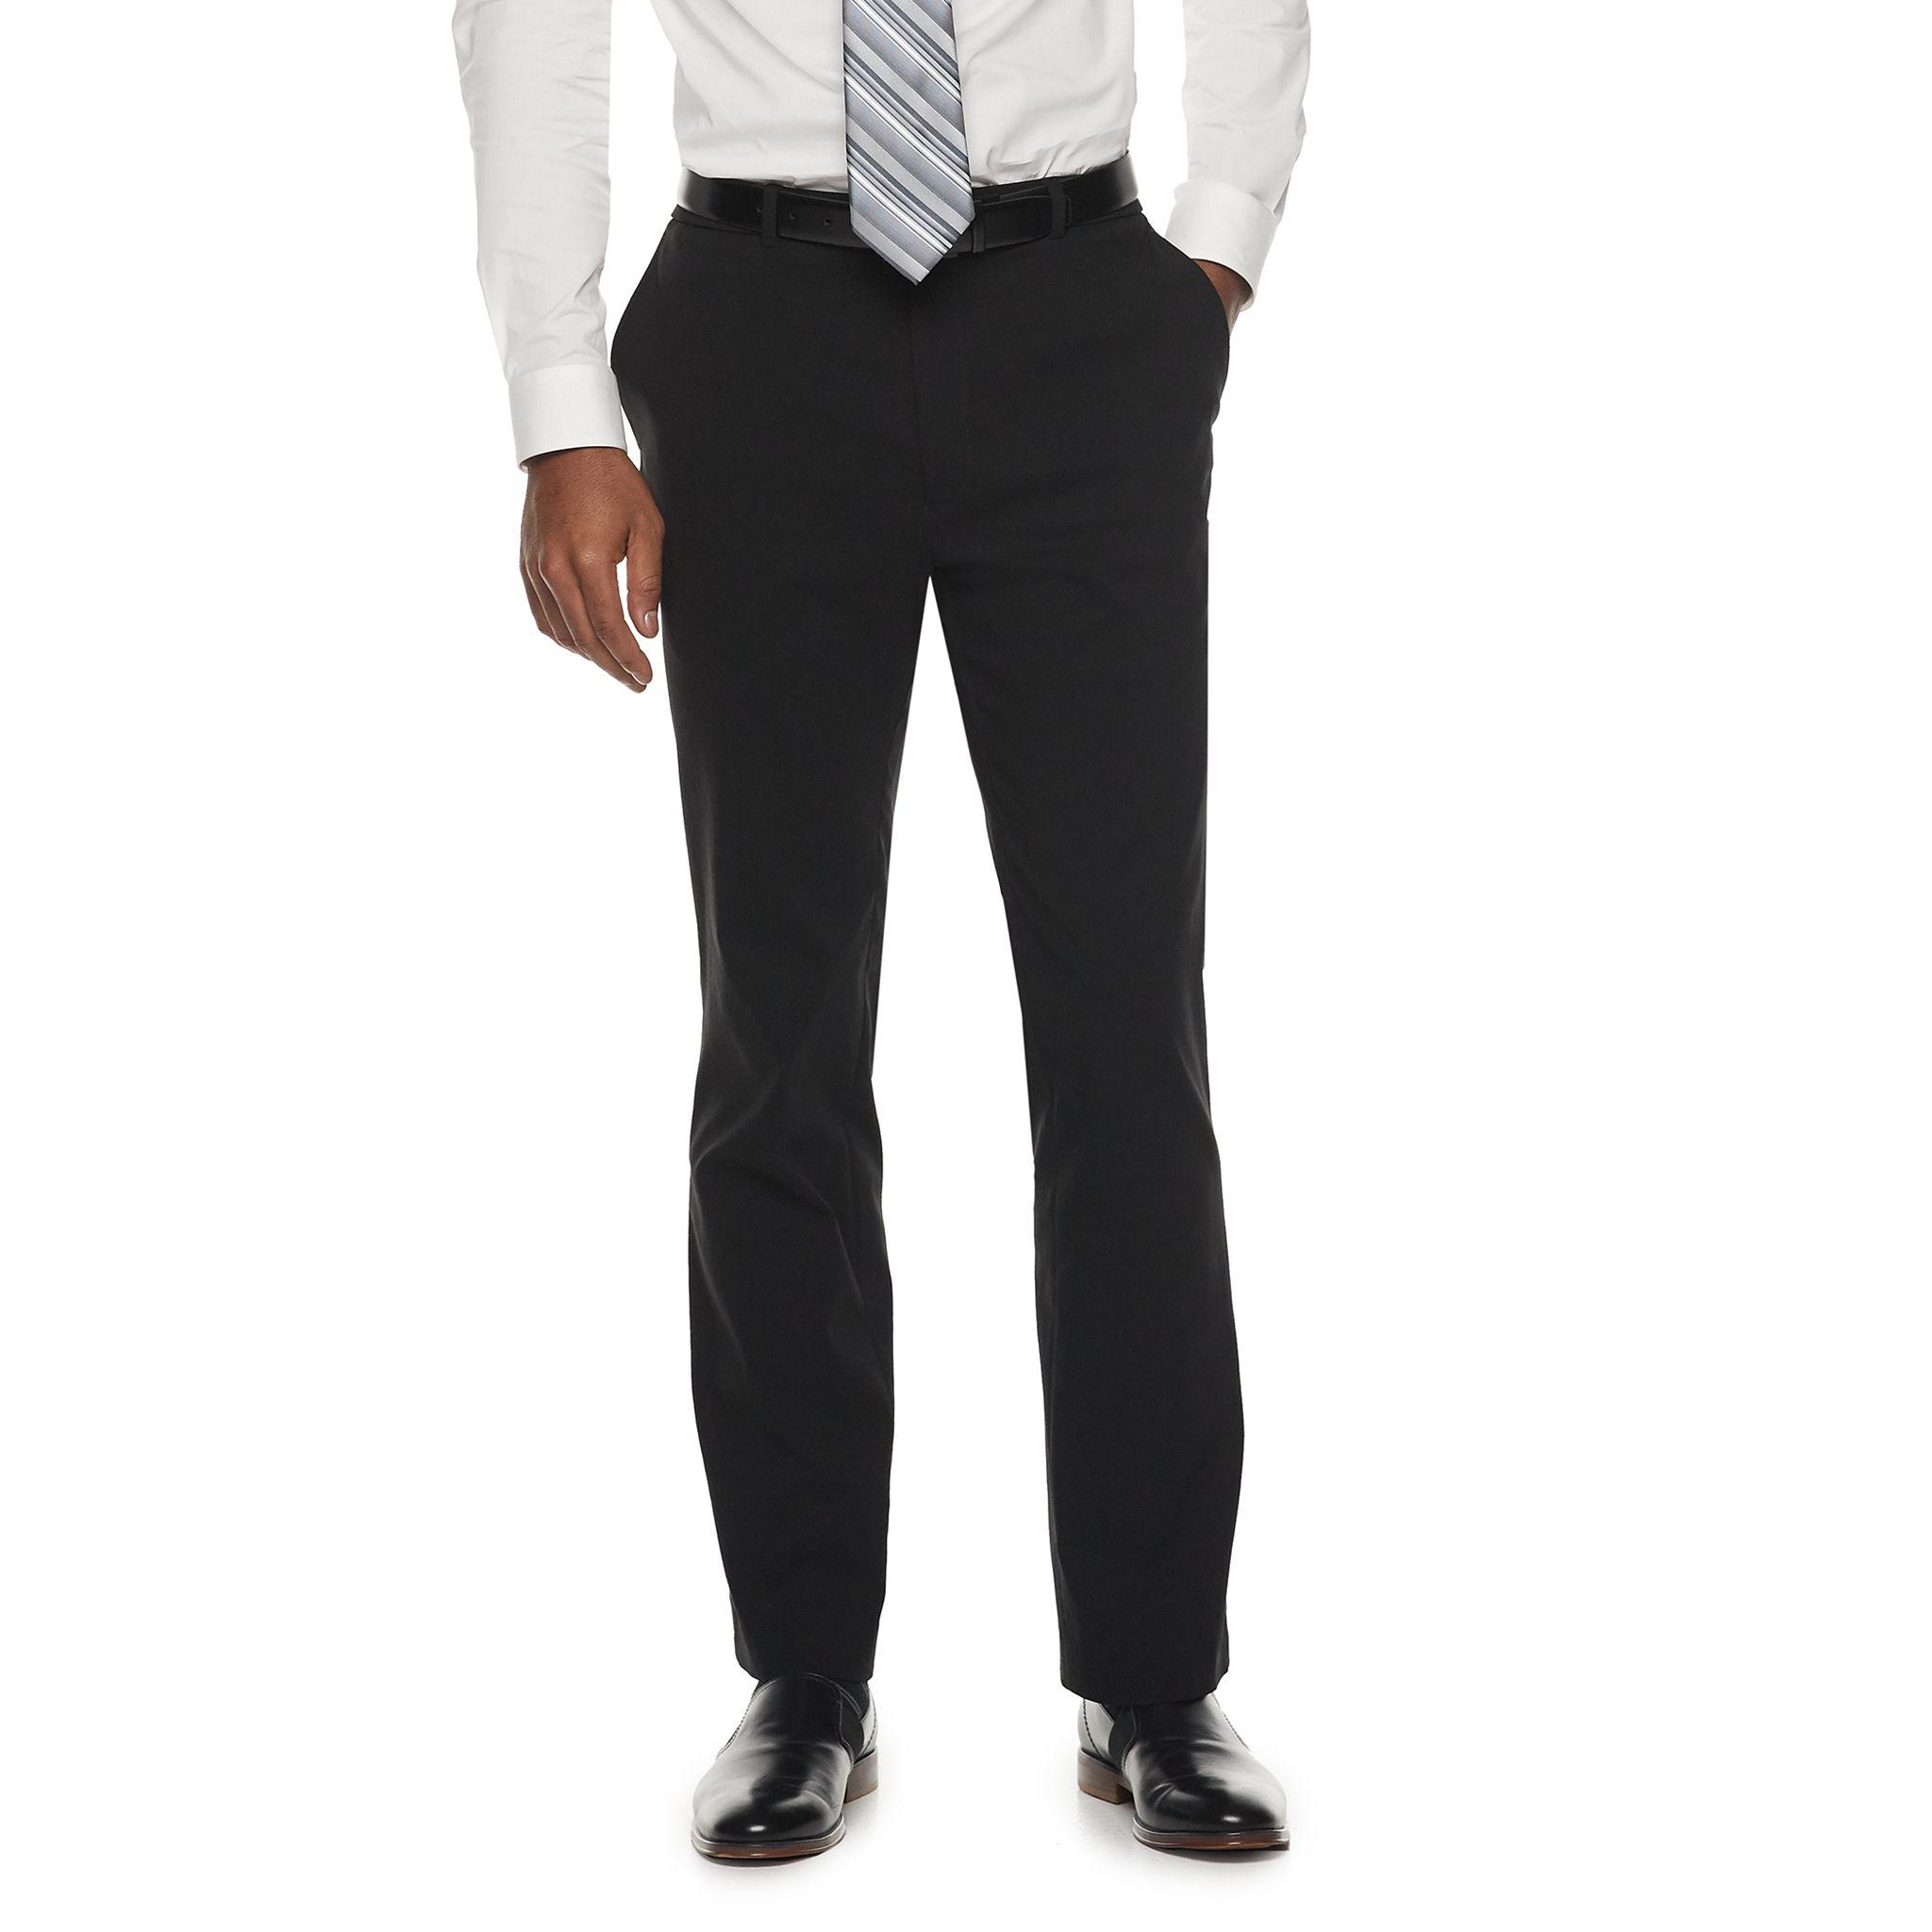 2-Pack Apt. 9 Men's Slim-Fit Performance Stretch Dress Pants